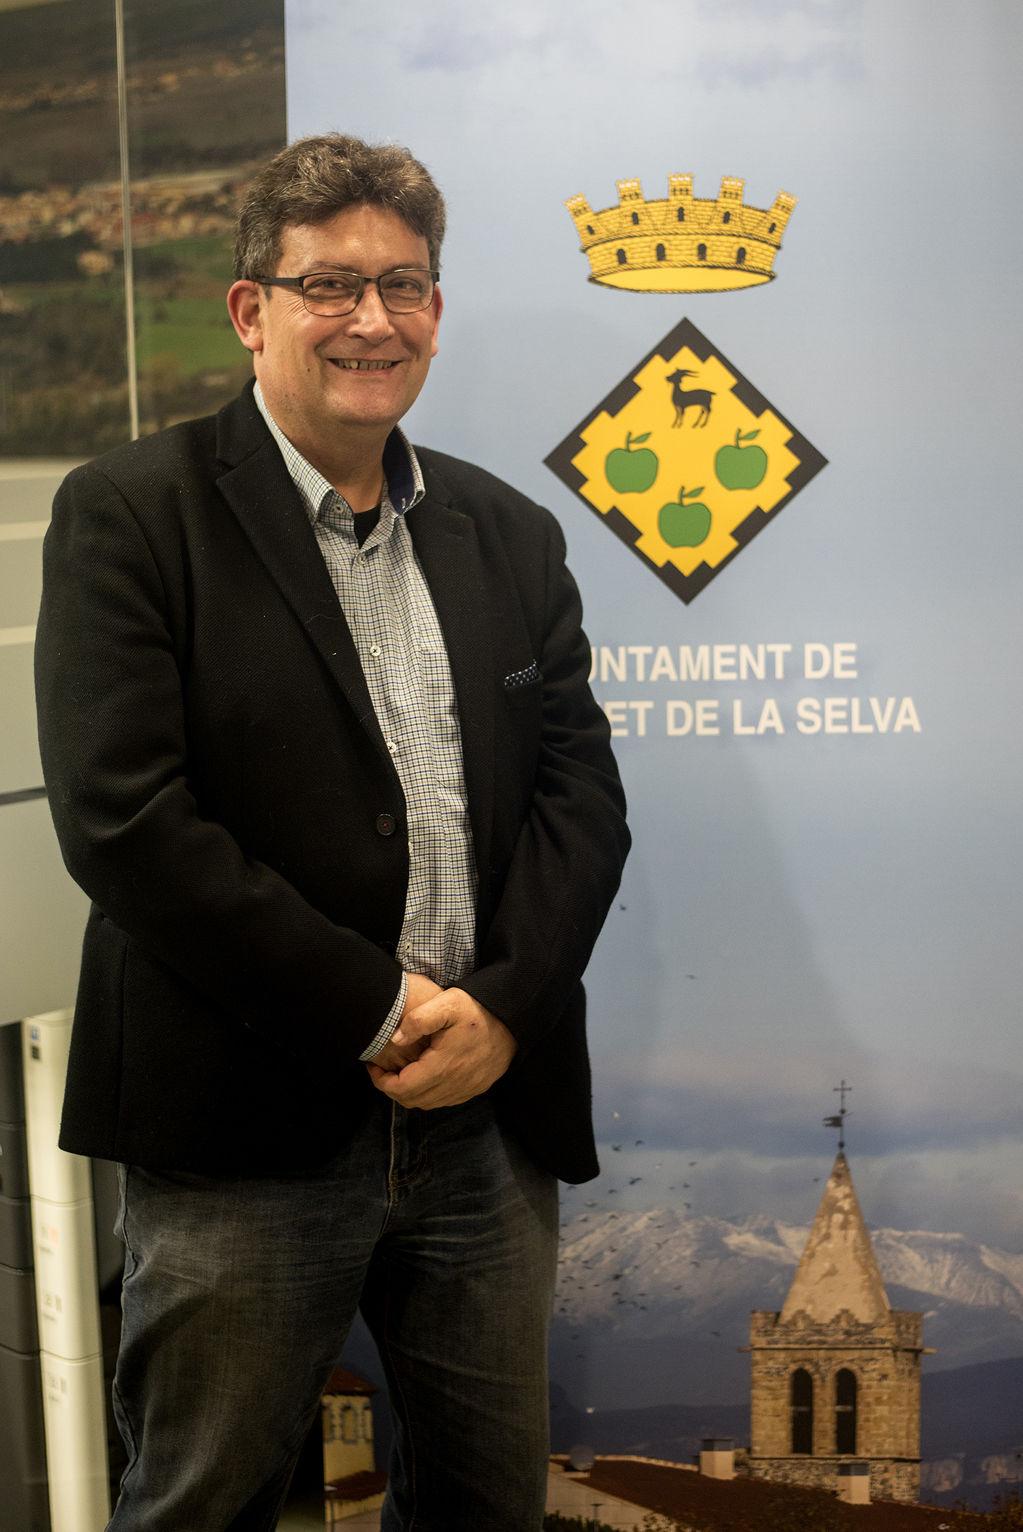 Javier Gómez Santos